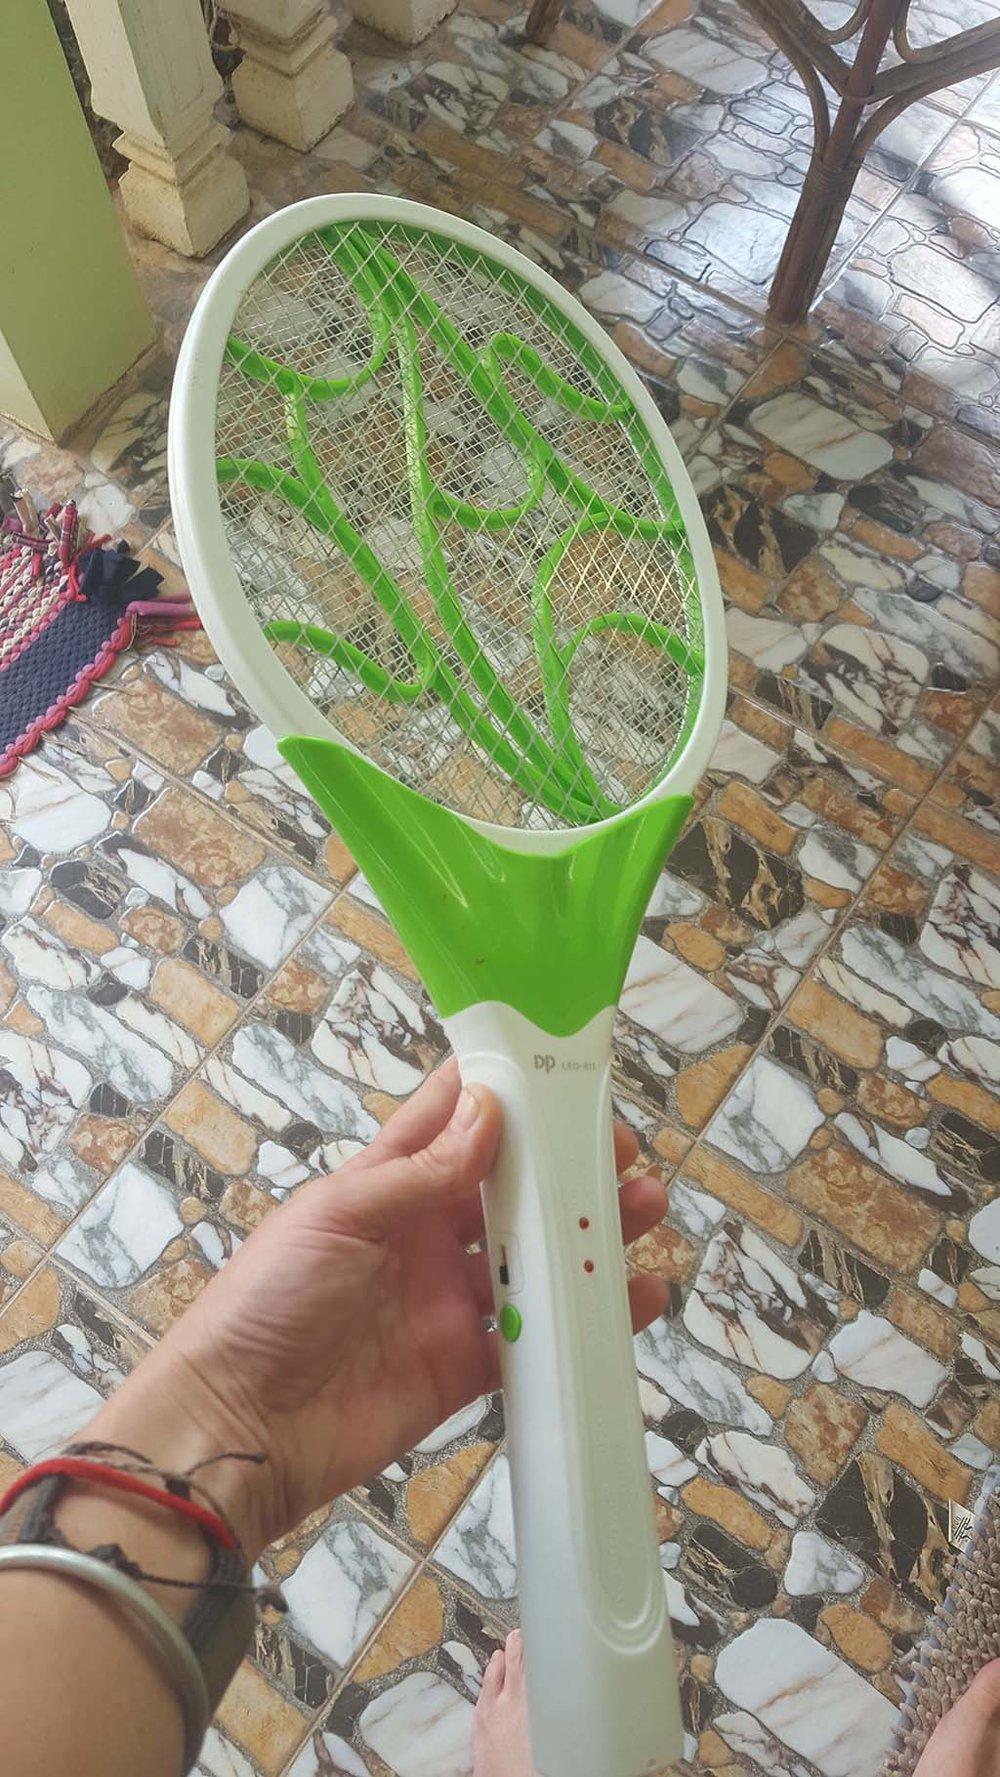 mosquito-electrocution-racket.jpg